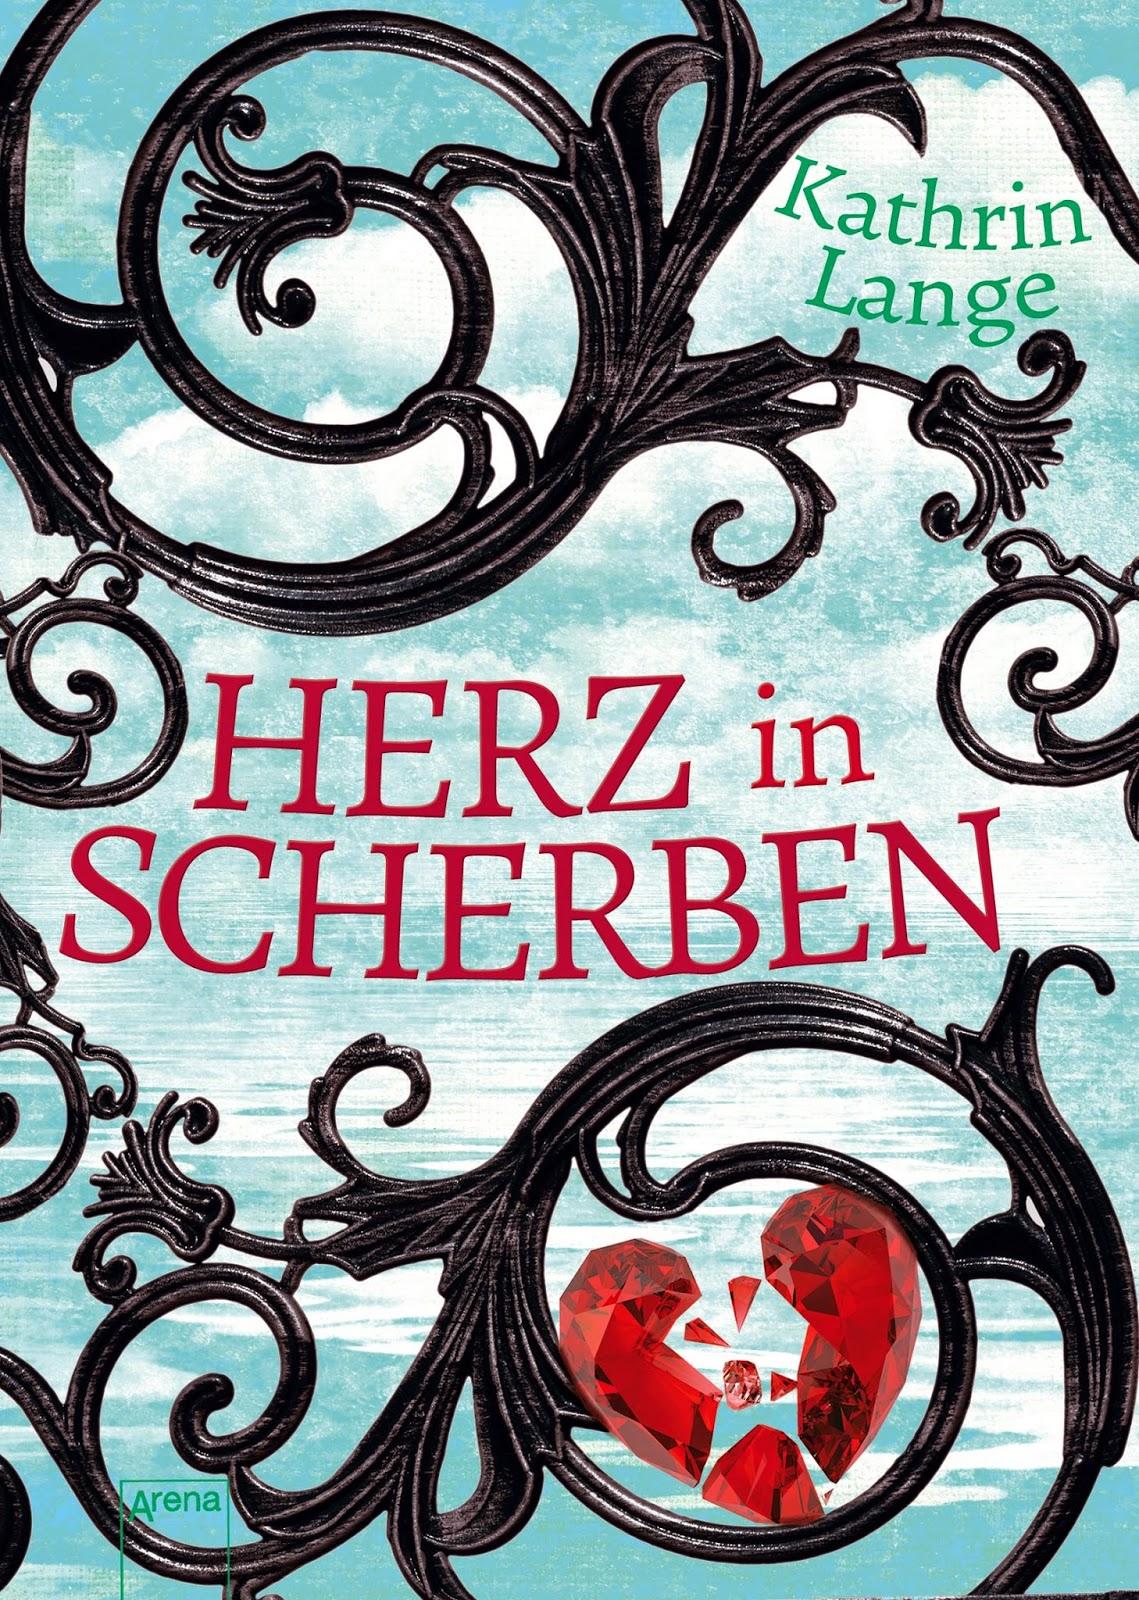 https://www.buchhaus-sternverlag.de/shop/action/productDetails/26044642/kathrin_lange_herz_in_scherben_3401600052.html?aUrl=90007403&searchId=0&originalSearchString=